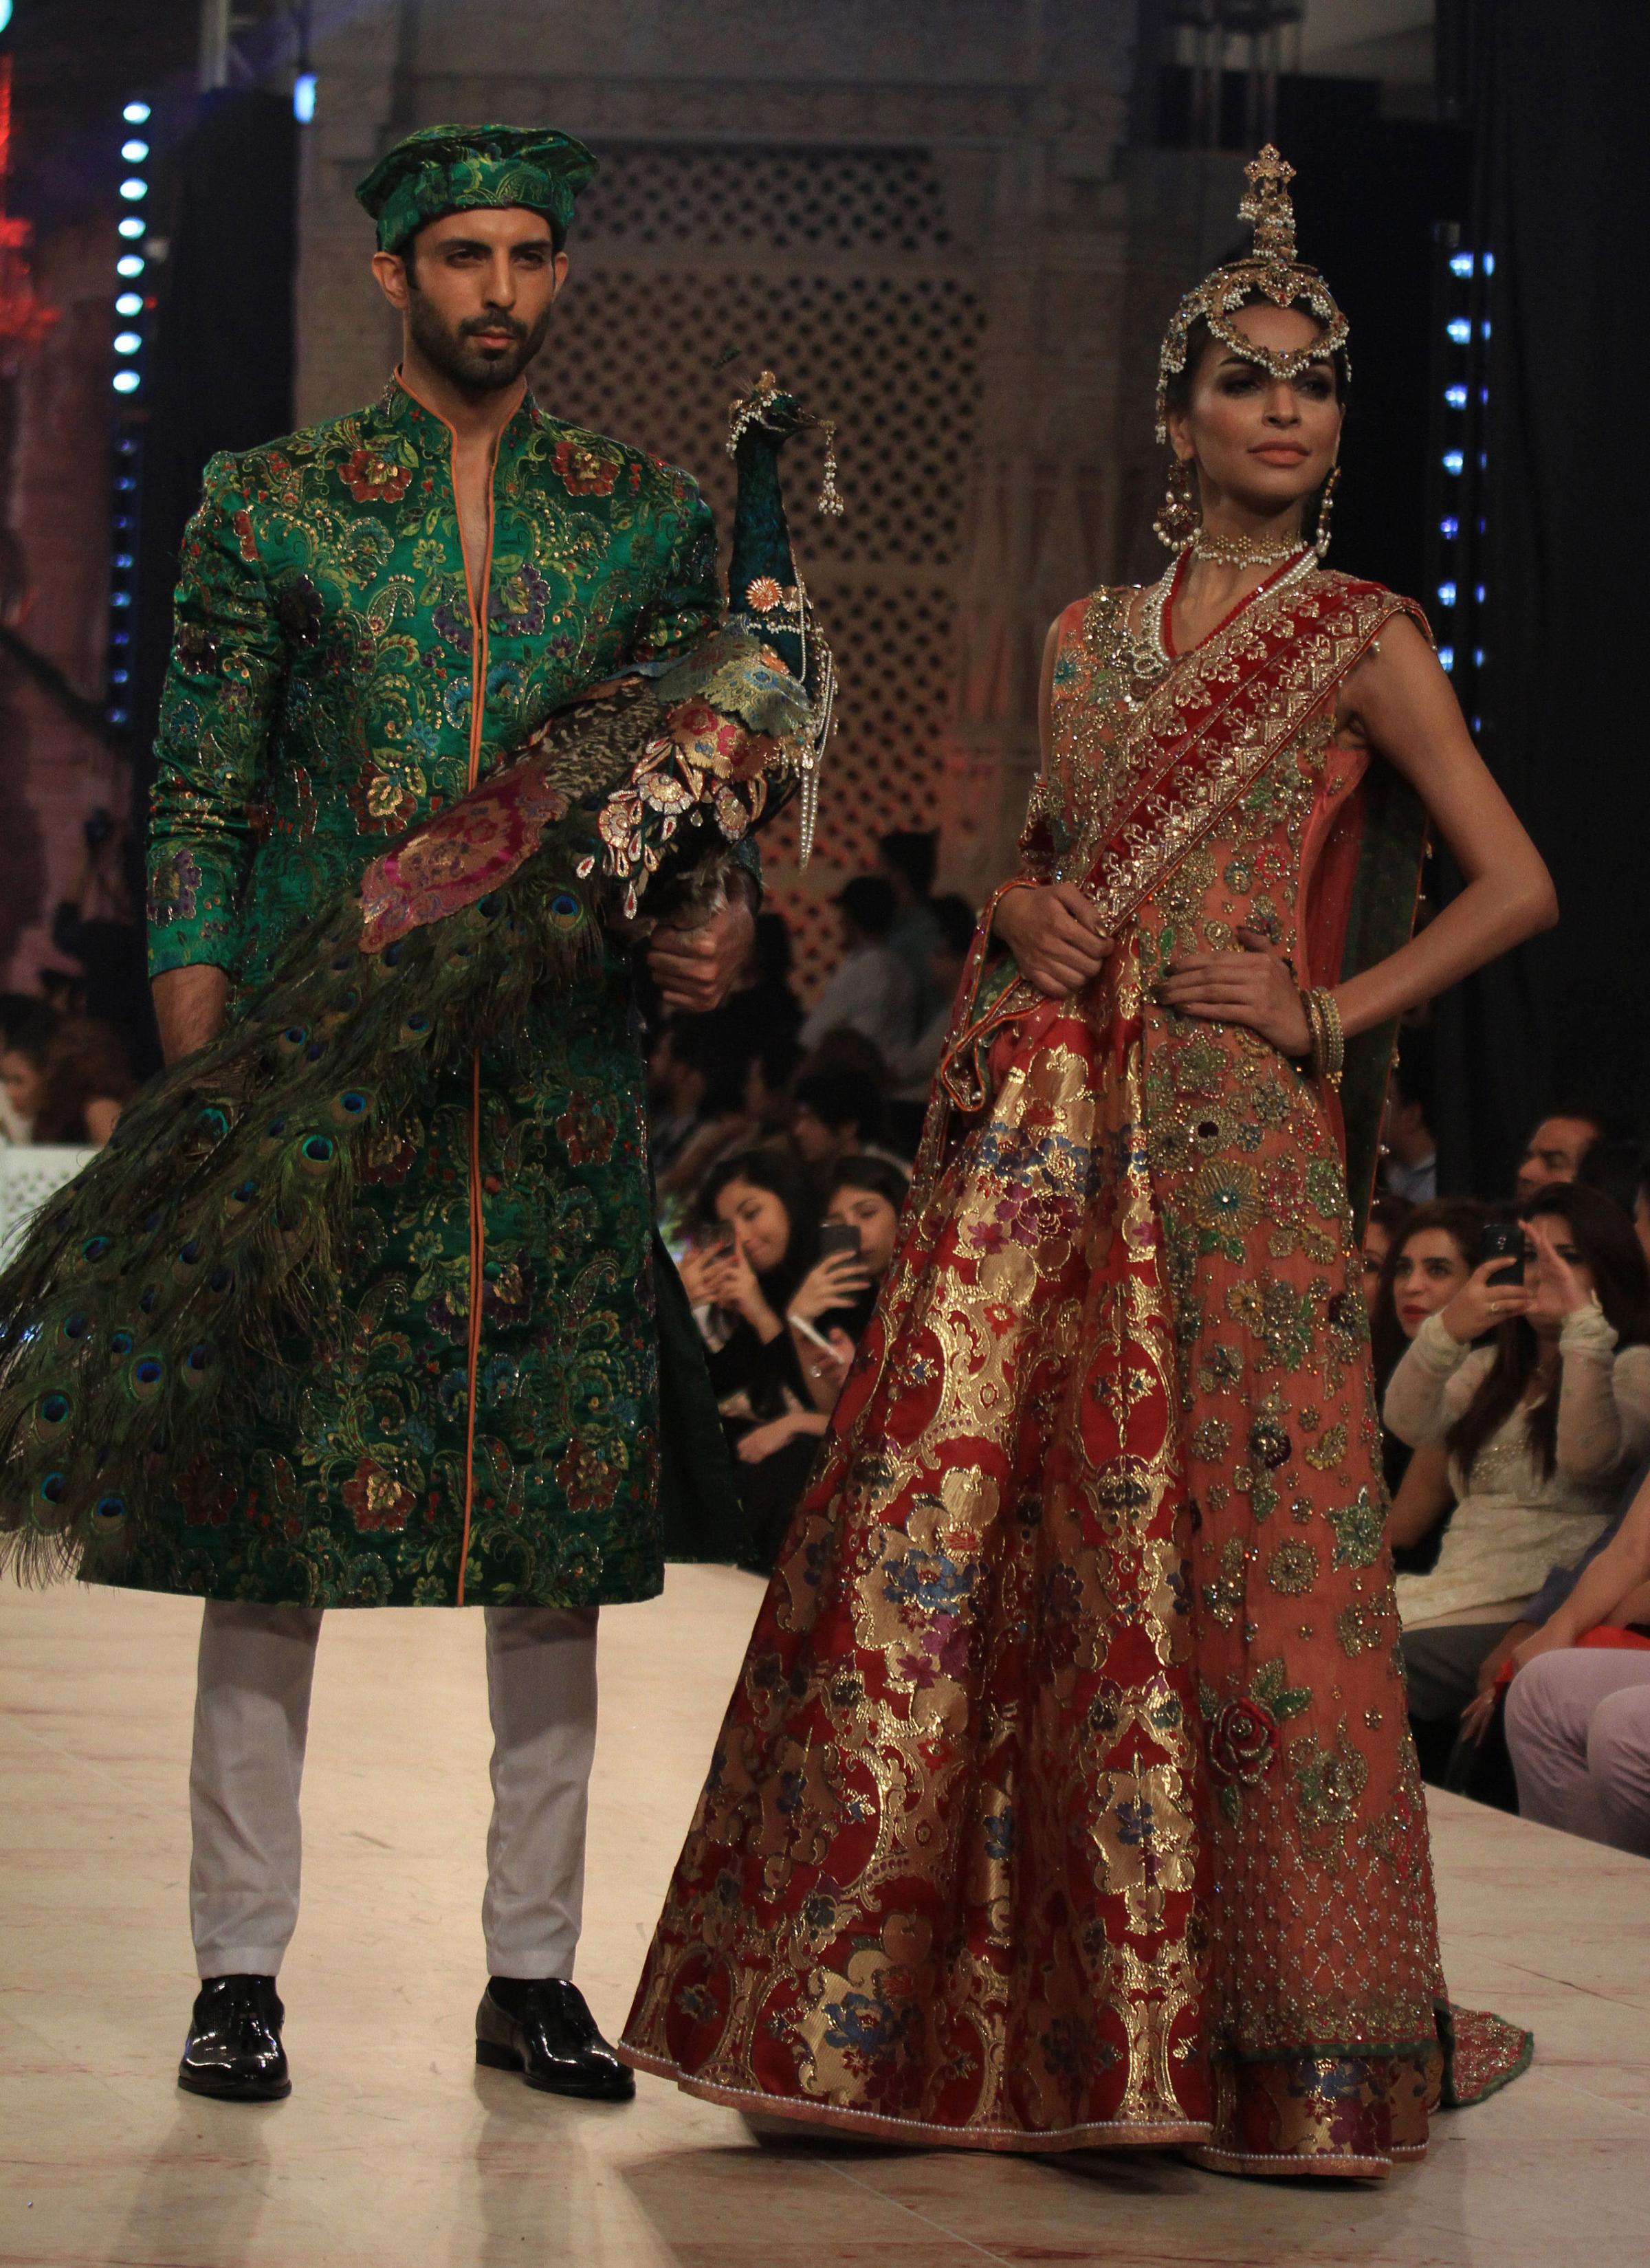 L'Oreal Paris and Pakistan Fashion show